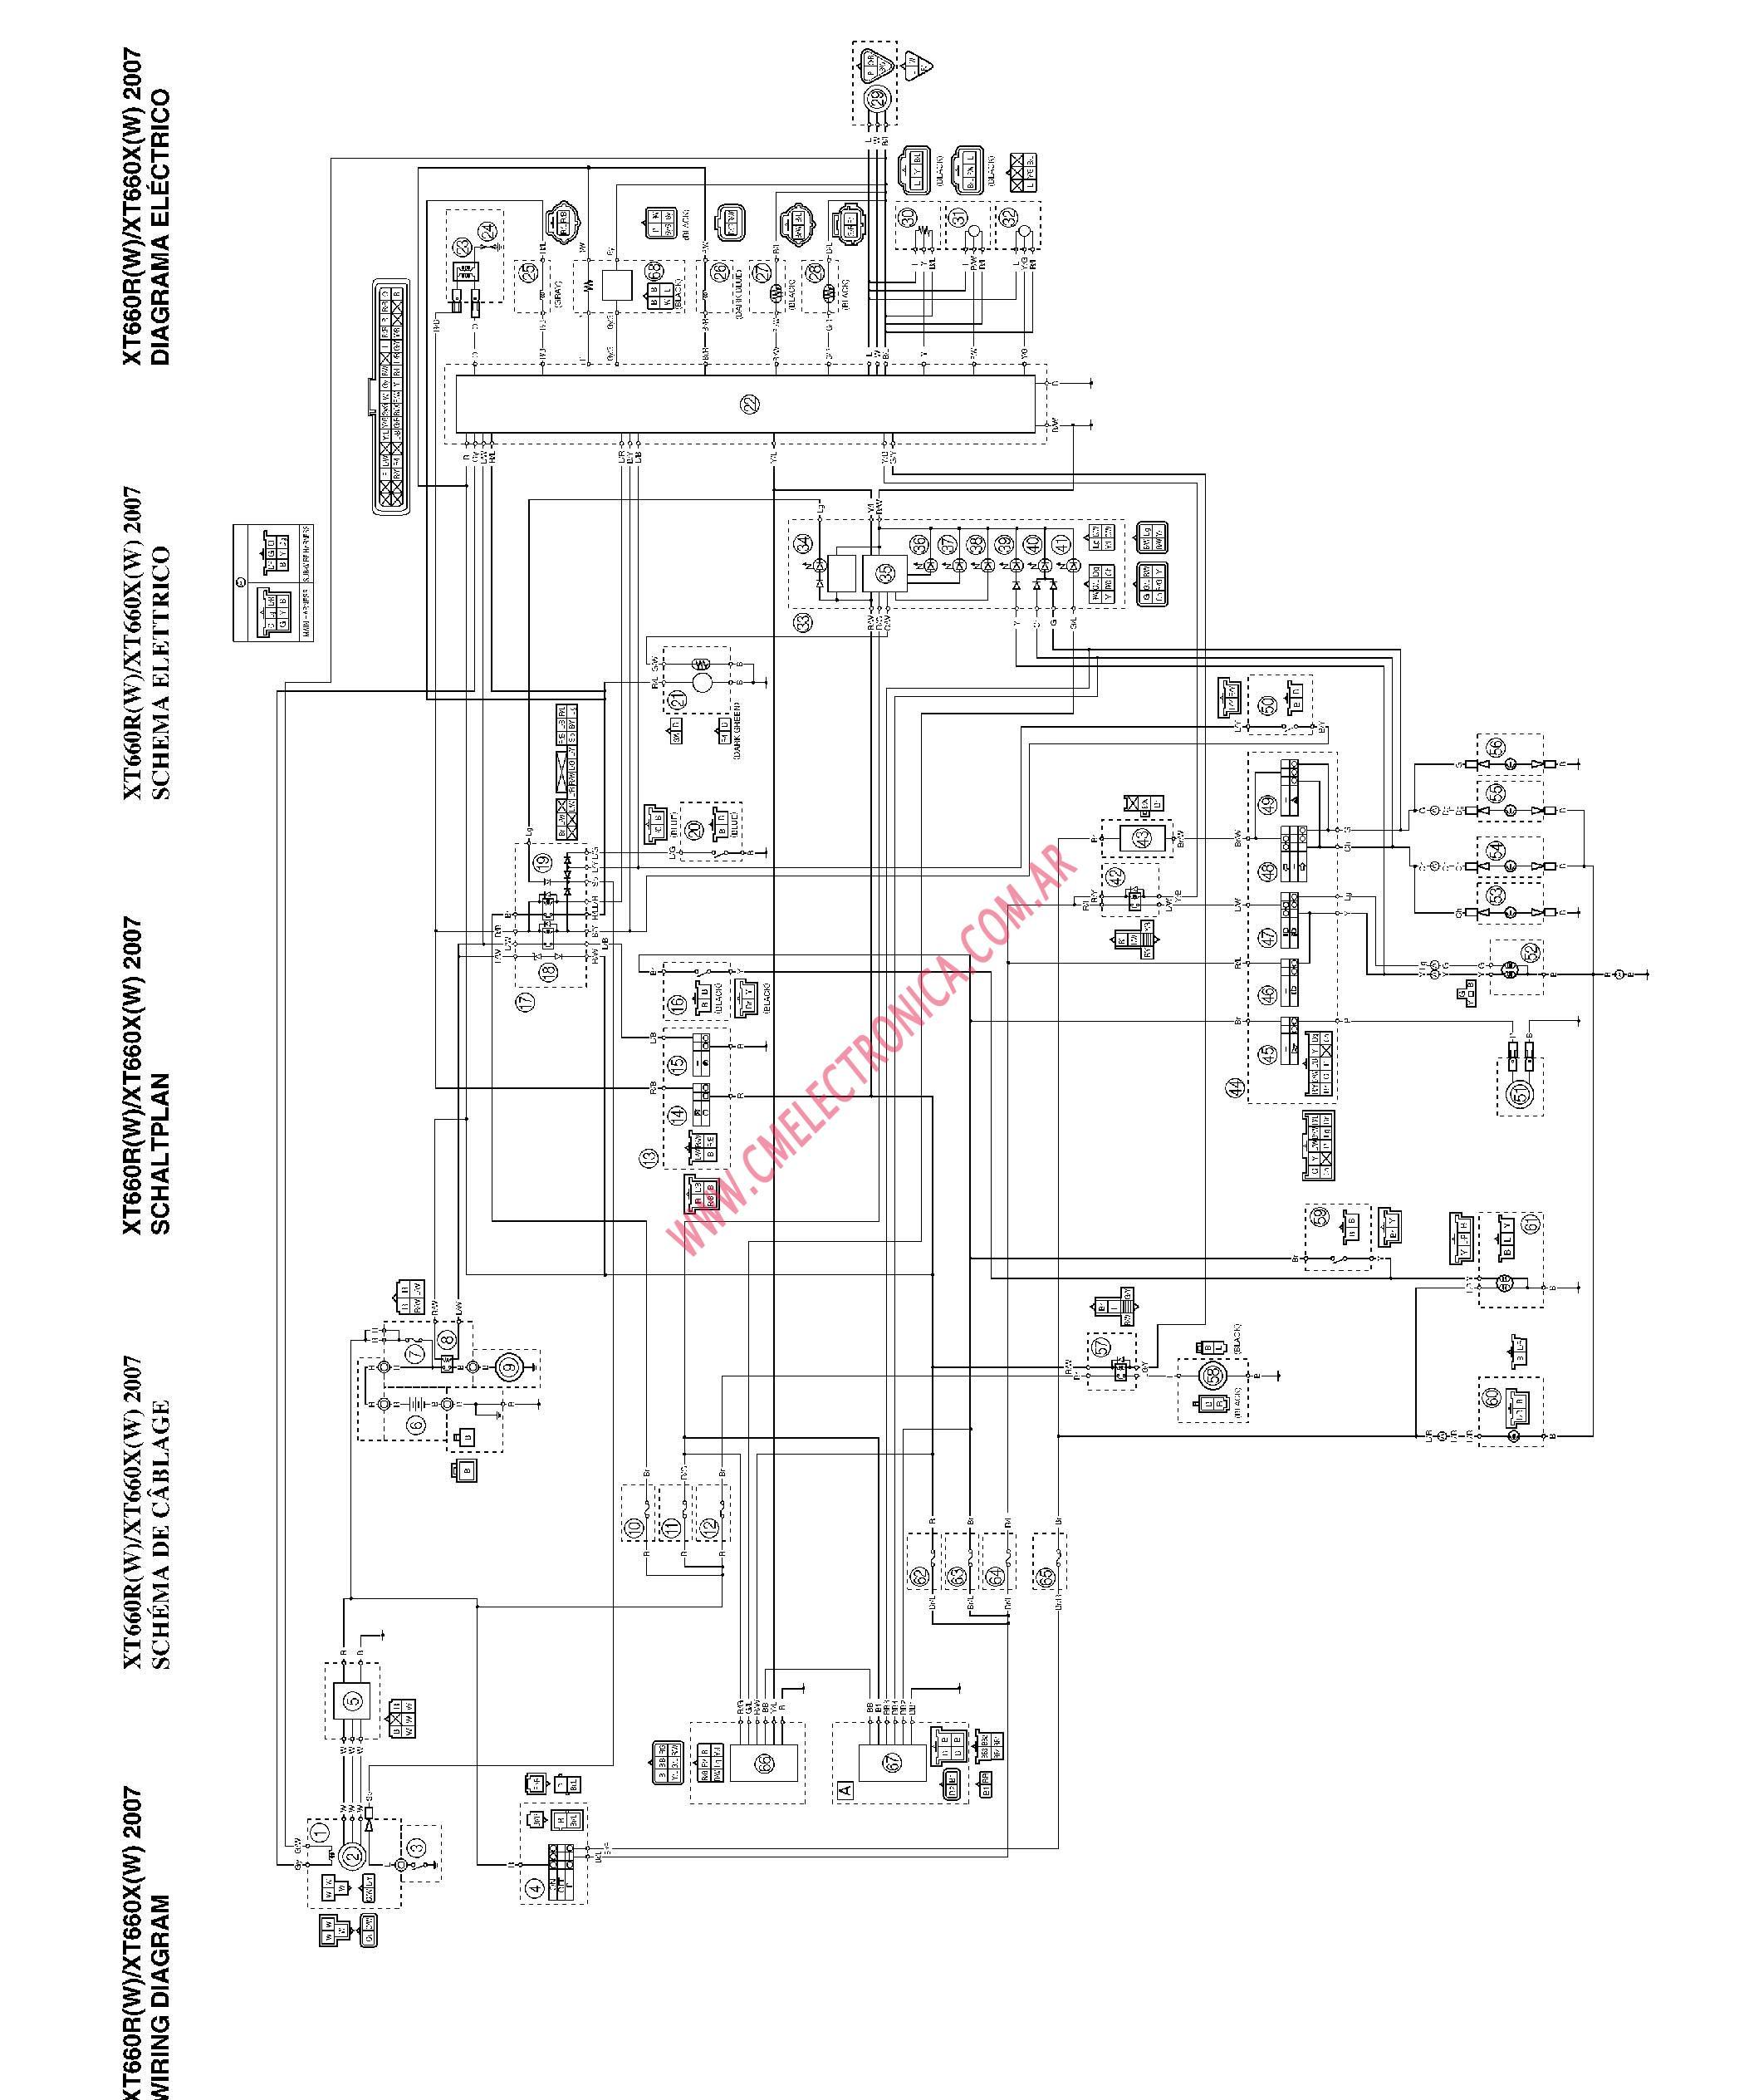 Vbb Wiring Diagram Detailed Schematics Vespatronic Electrical Diagrams Whirlpool Refrigerator